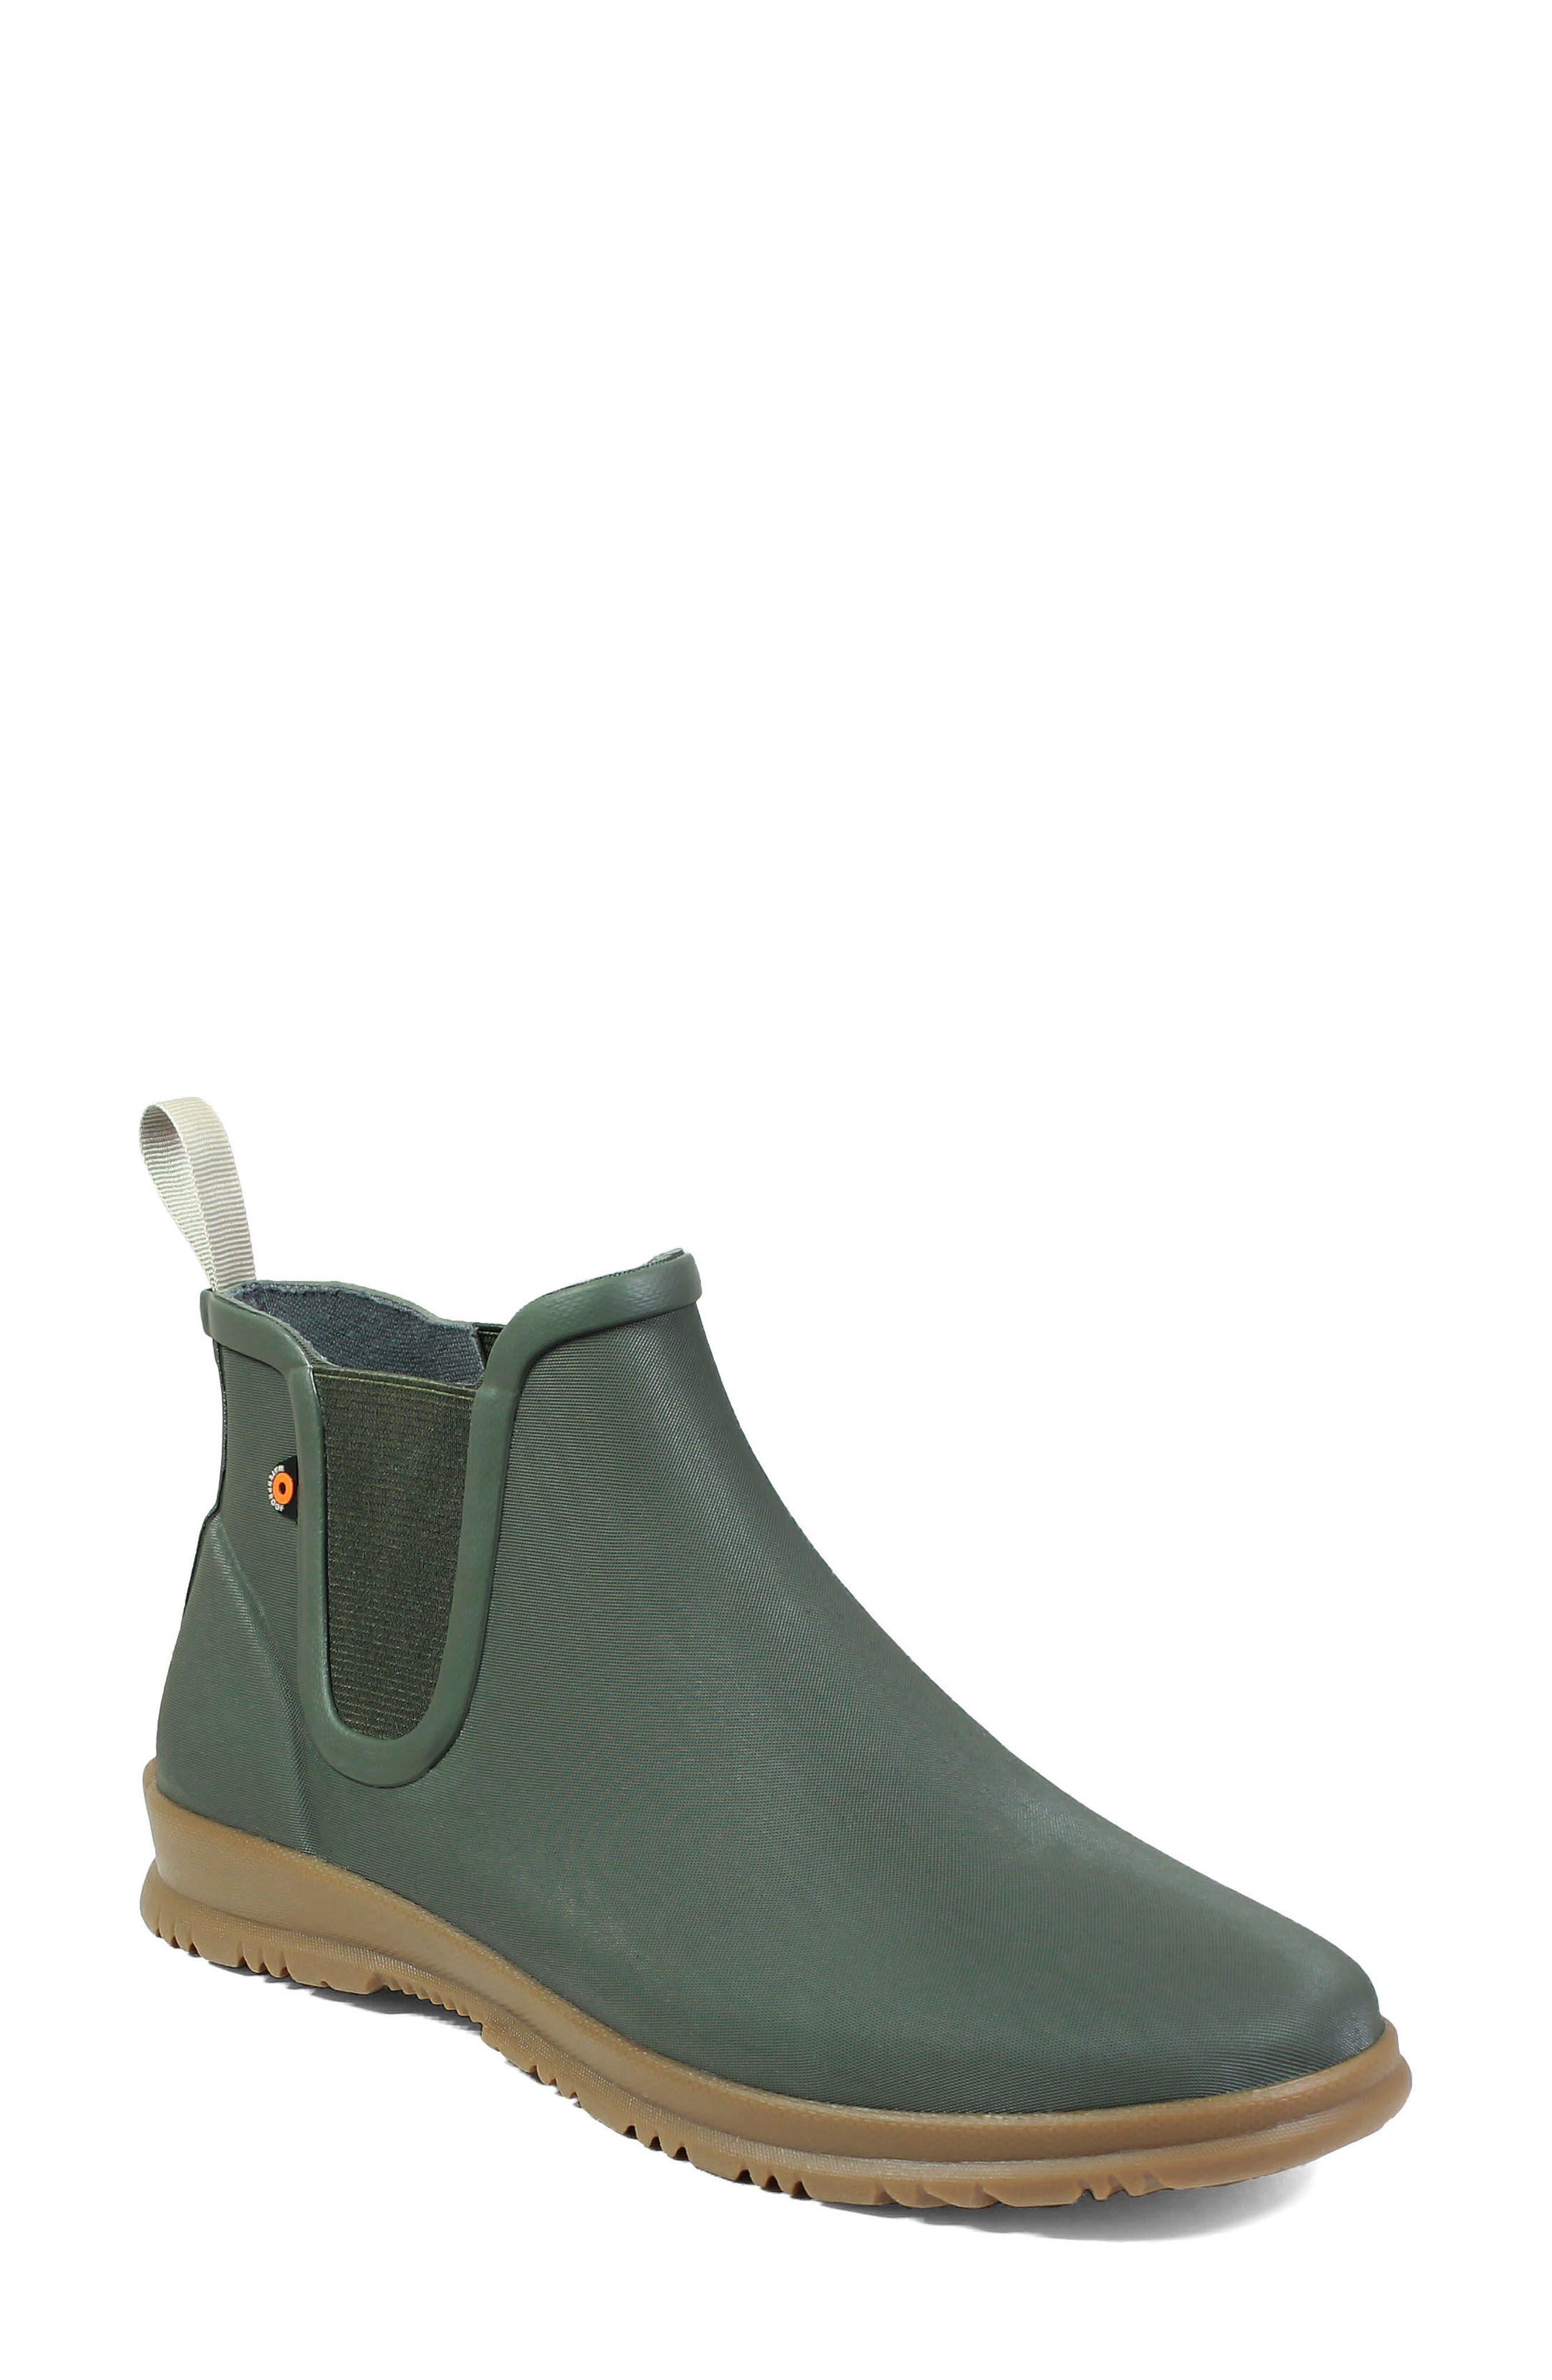 Bogs Sweetpea Rain Boot, Green